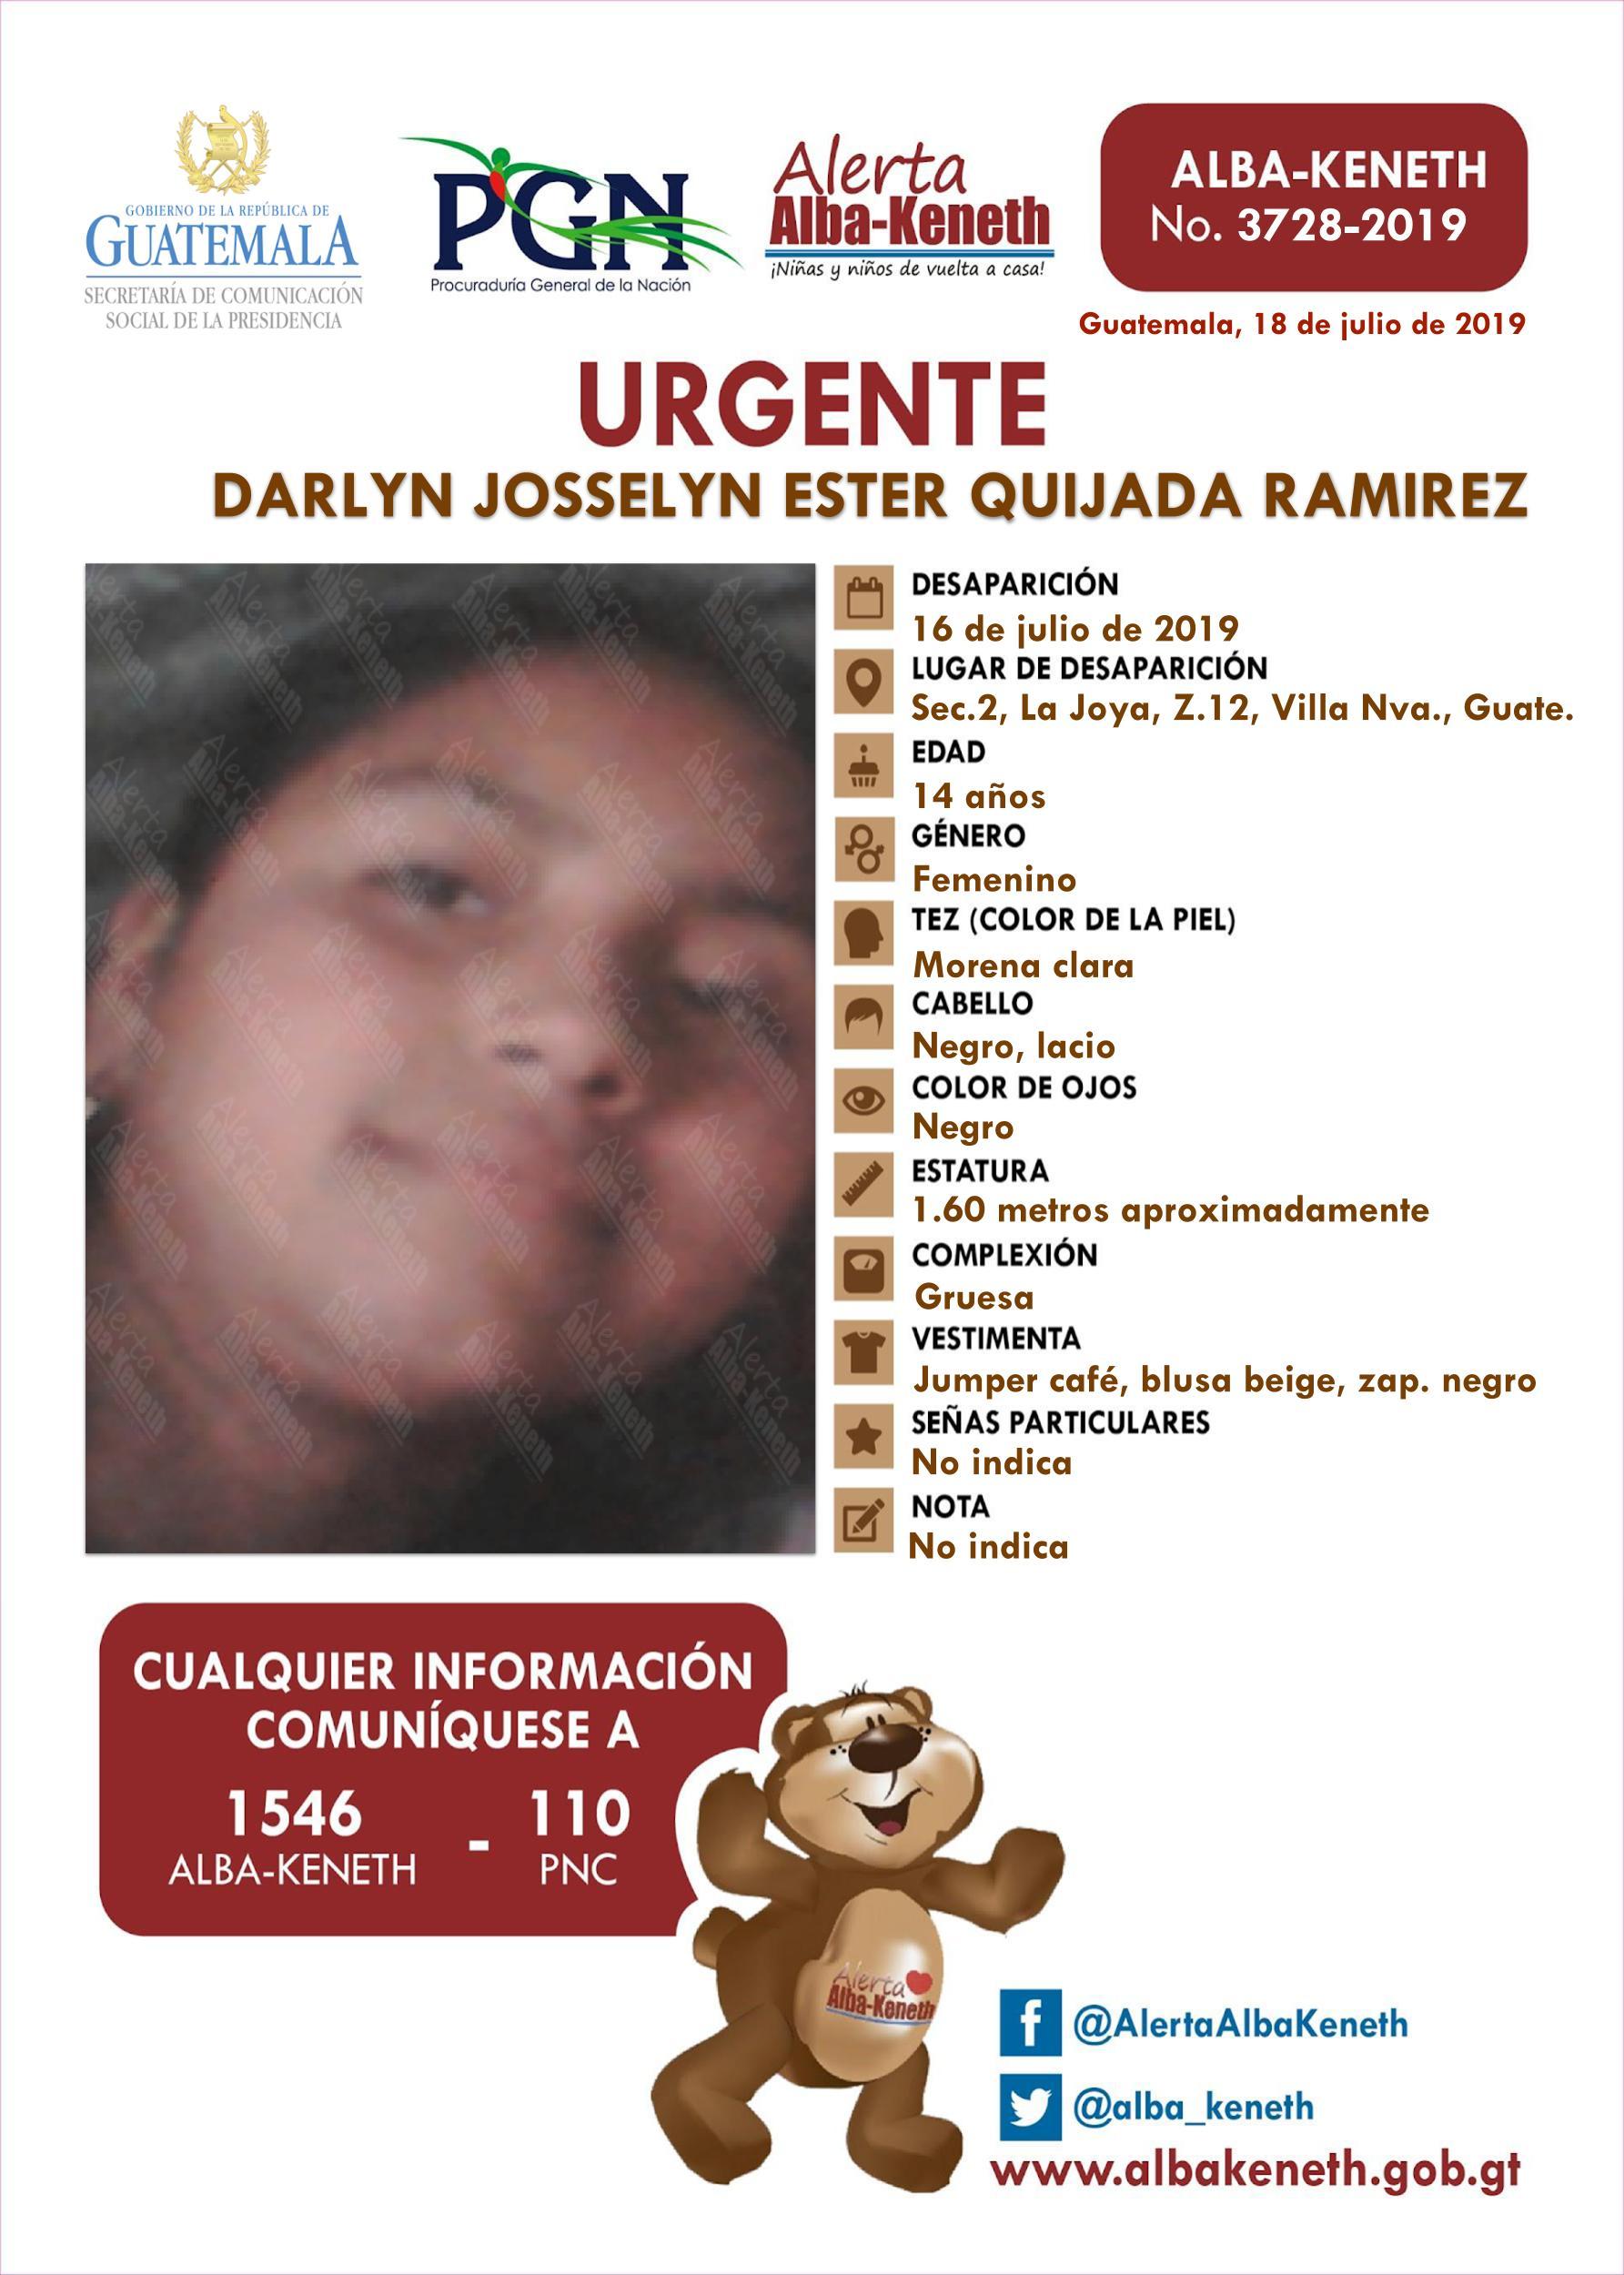 Darlyn Josselyn Ester Quijada Ramirez